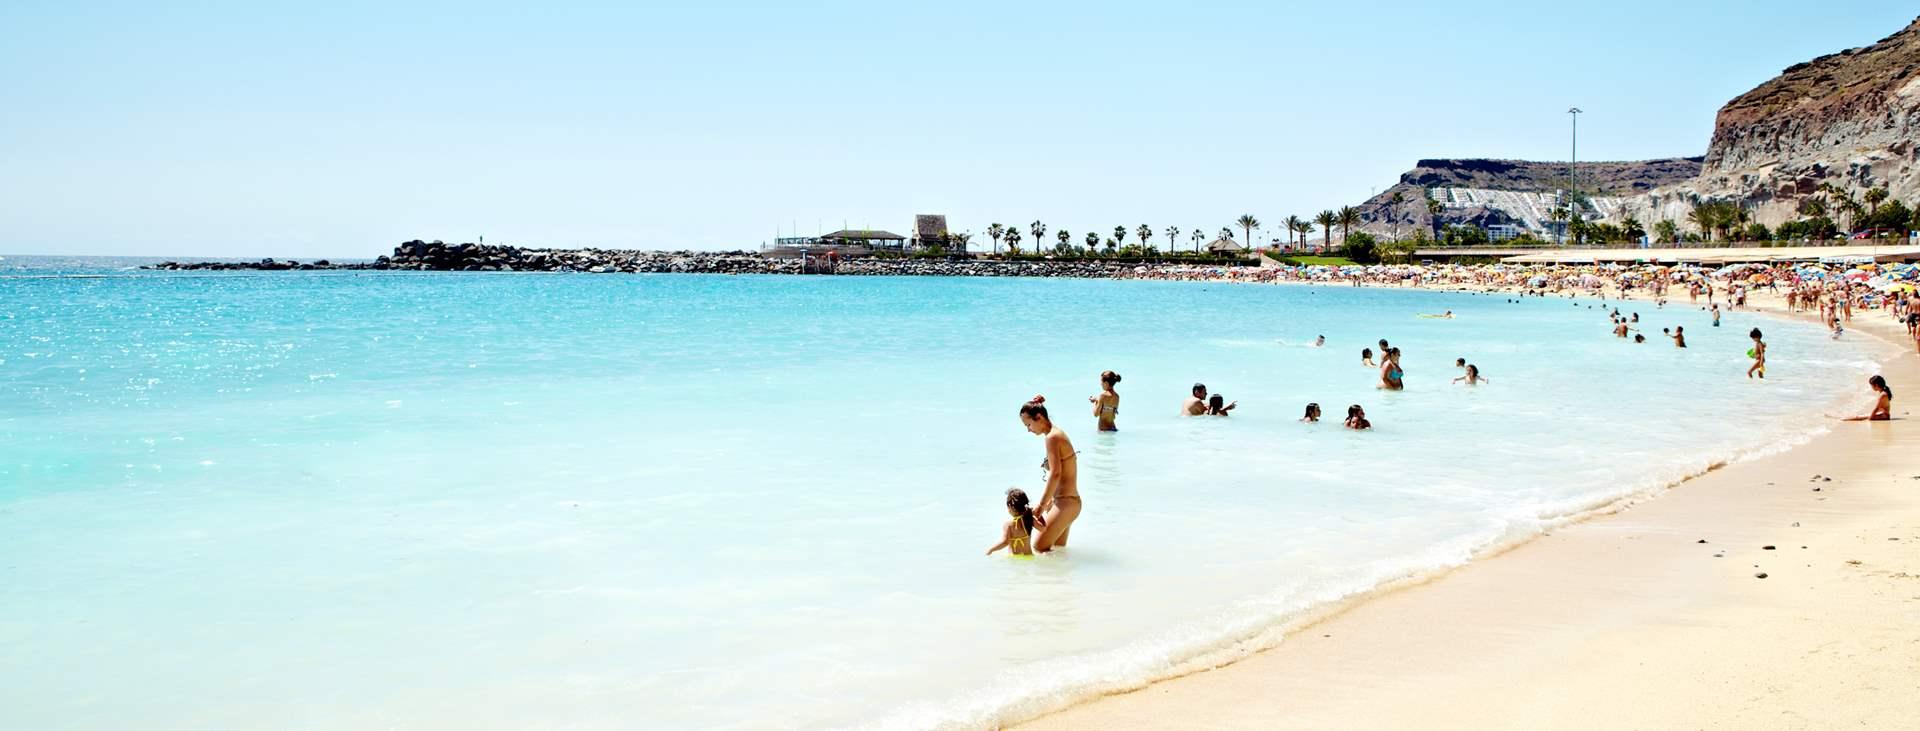 Varaa All Inclusive -loma Playa de Amadoresissa, Gran Canarialla